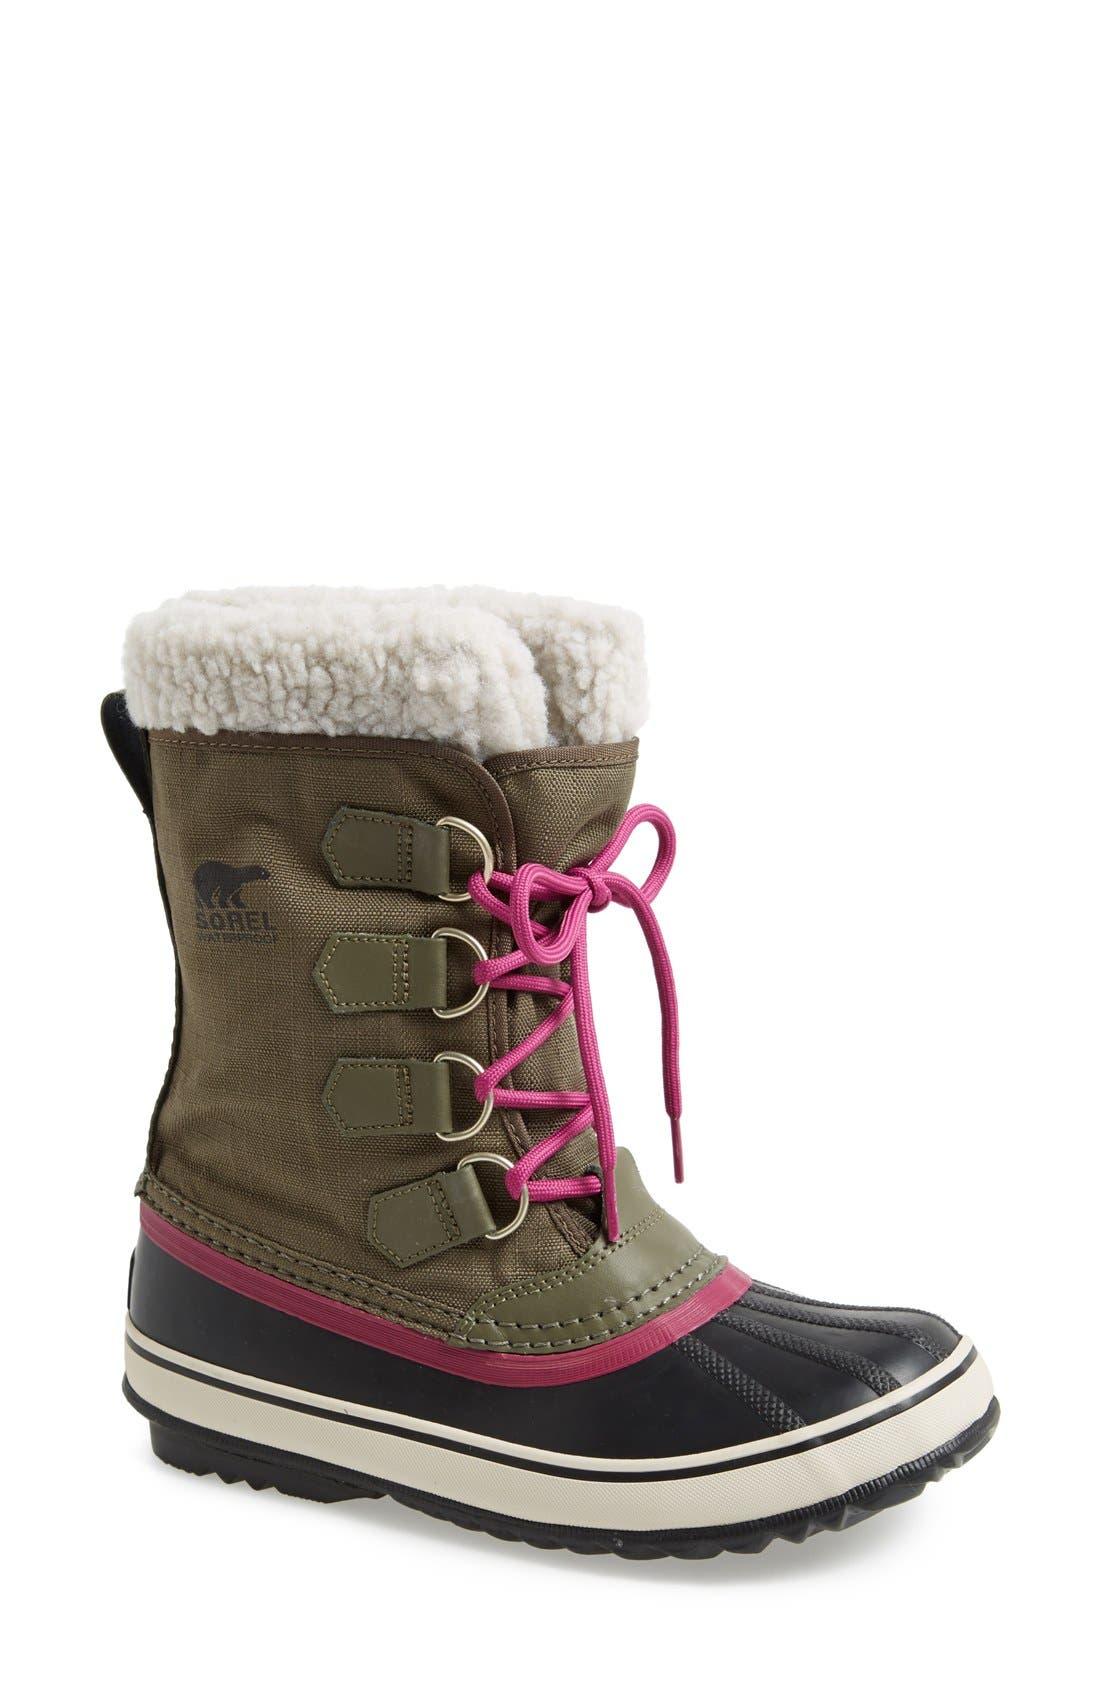 Alternate Image 1 Selected - SOREL 'Winter Carnival' Boot (Women)